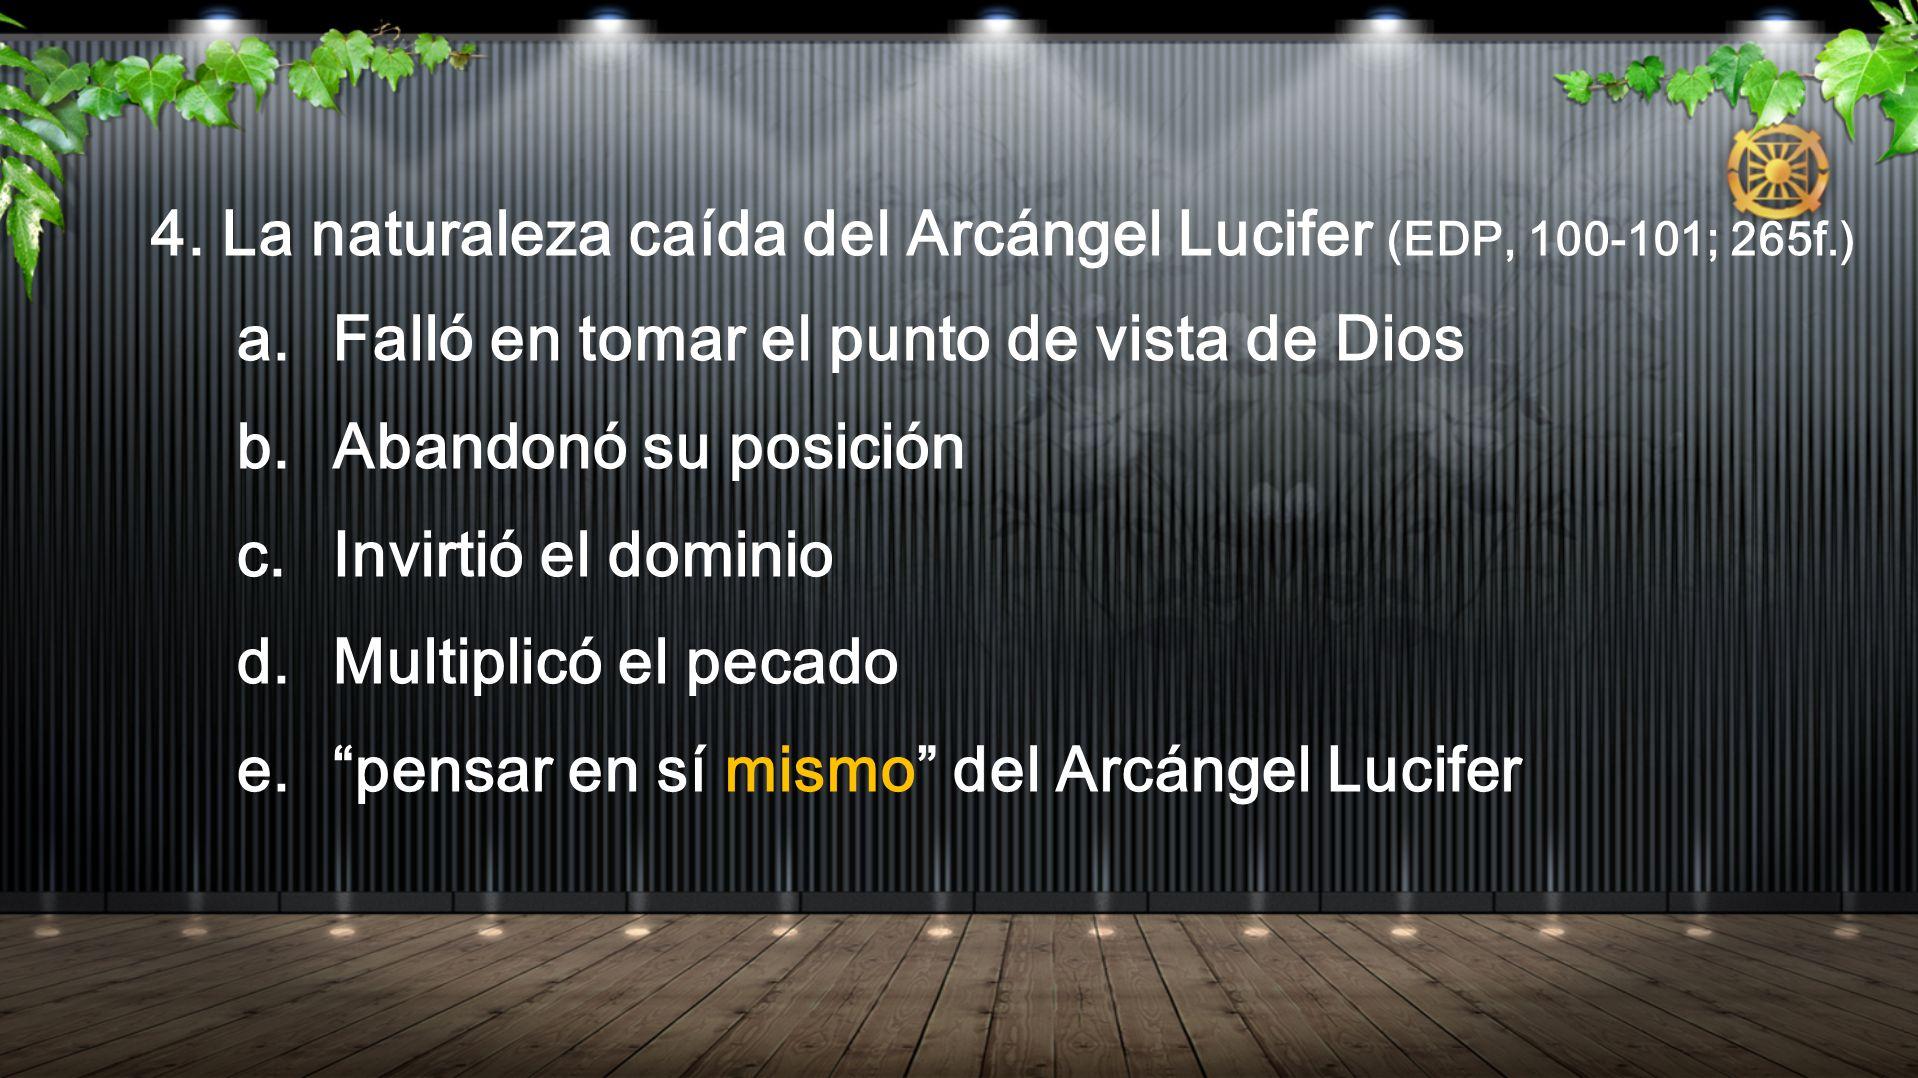 4. La naturaleza caída del Arcángel Lucifer (EDP, 100-101; 265f.)